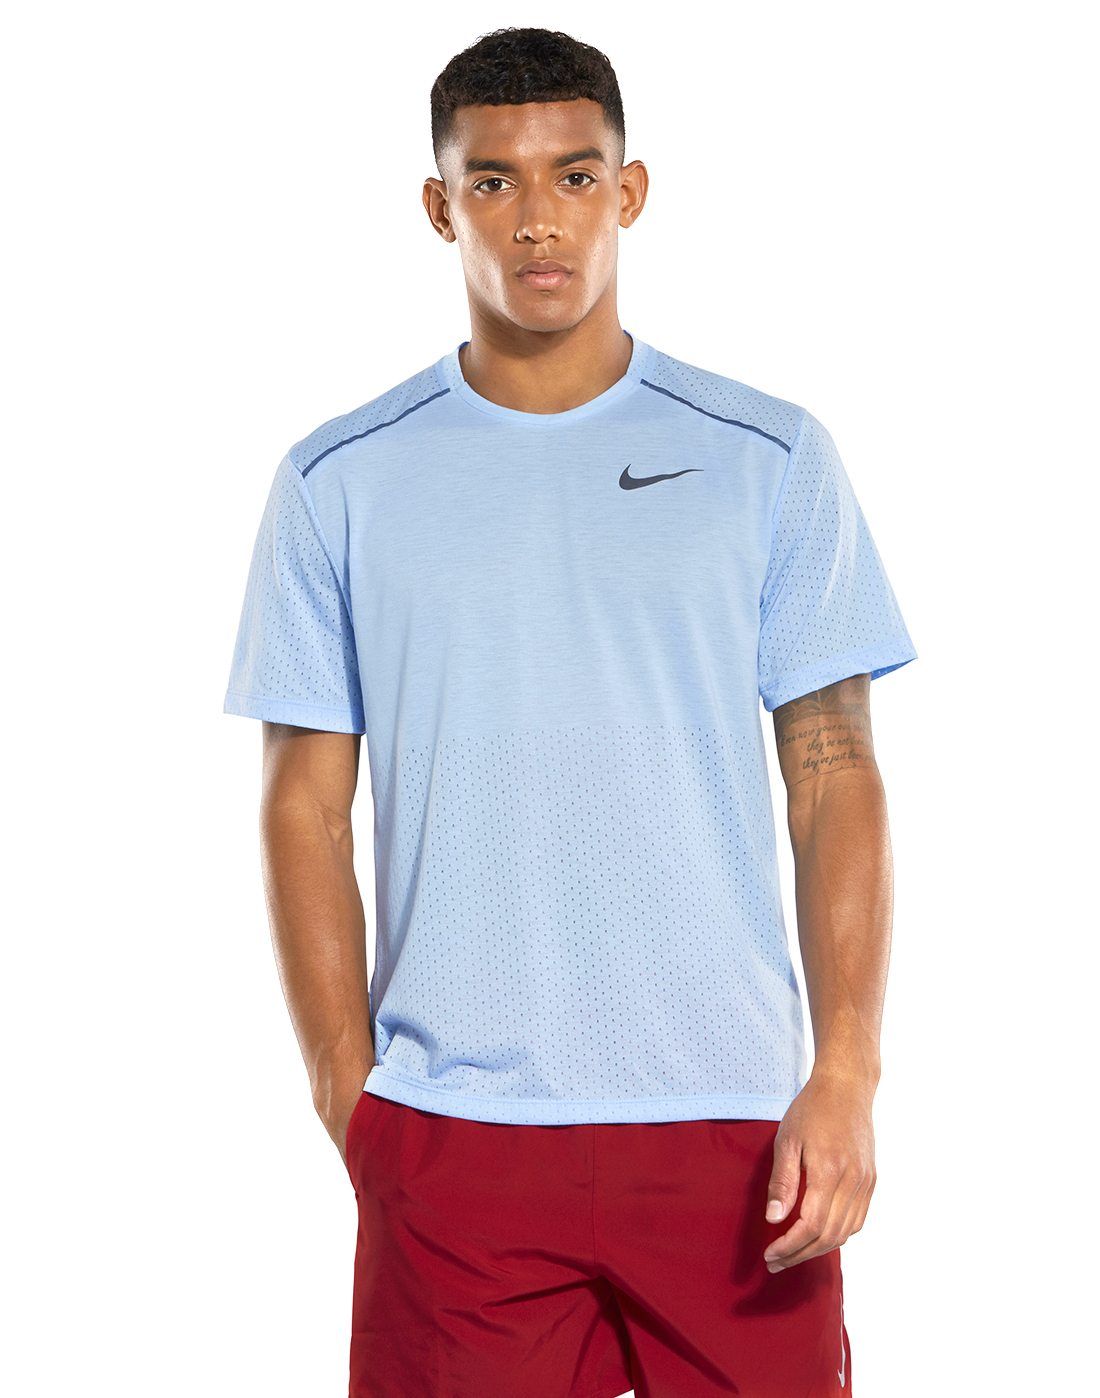 a5bed9149 Men's Light Blue Nike Running T-Shirt | Life Style Sports